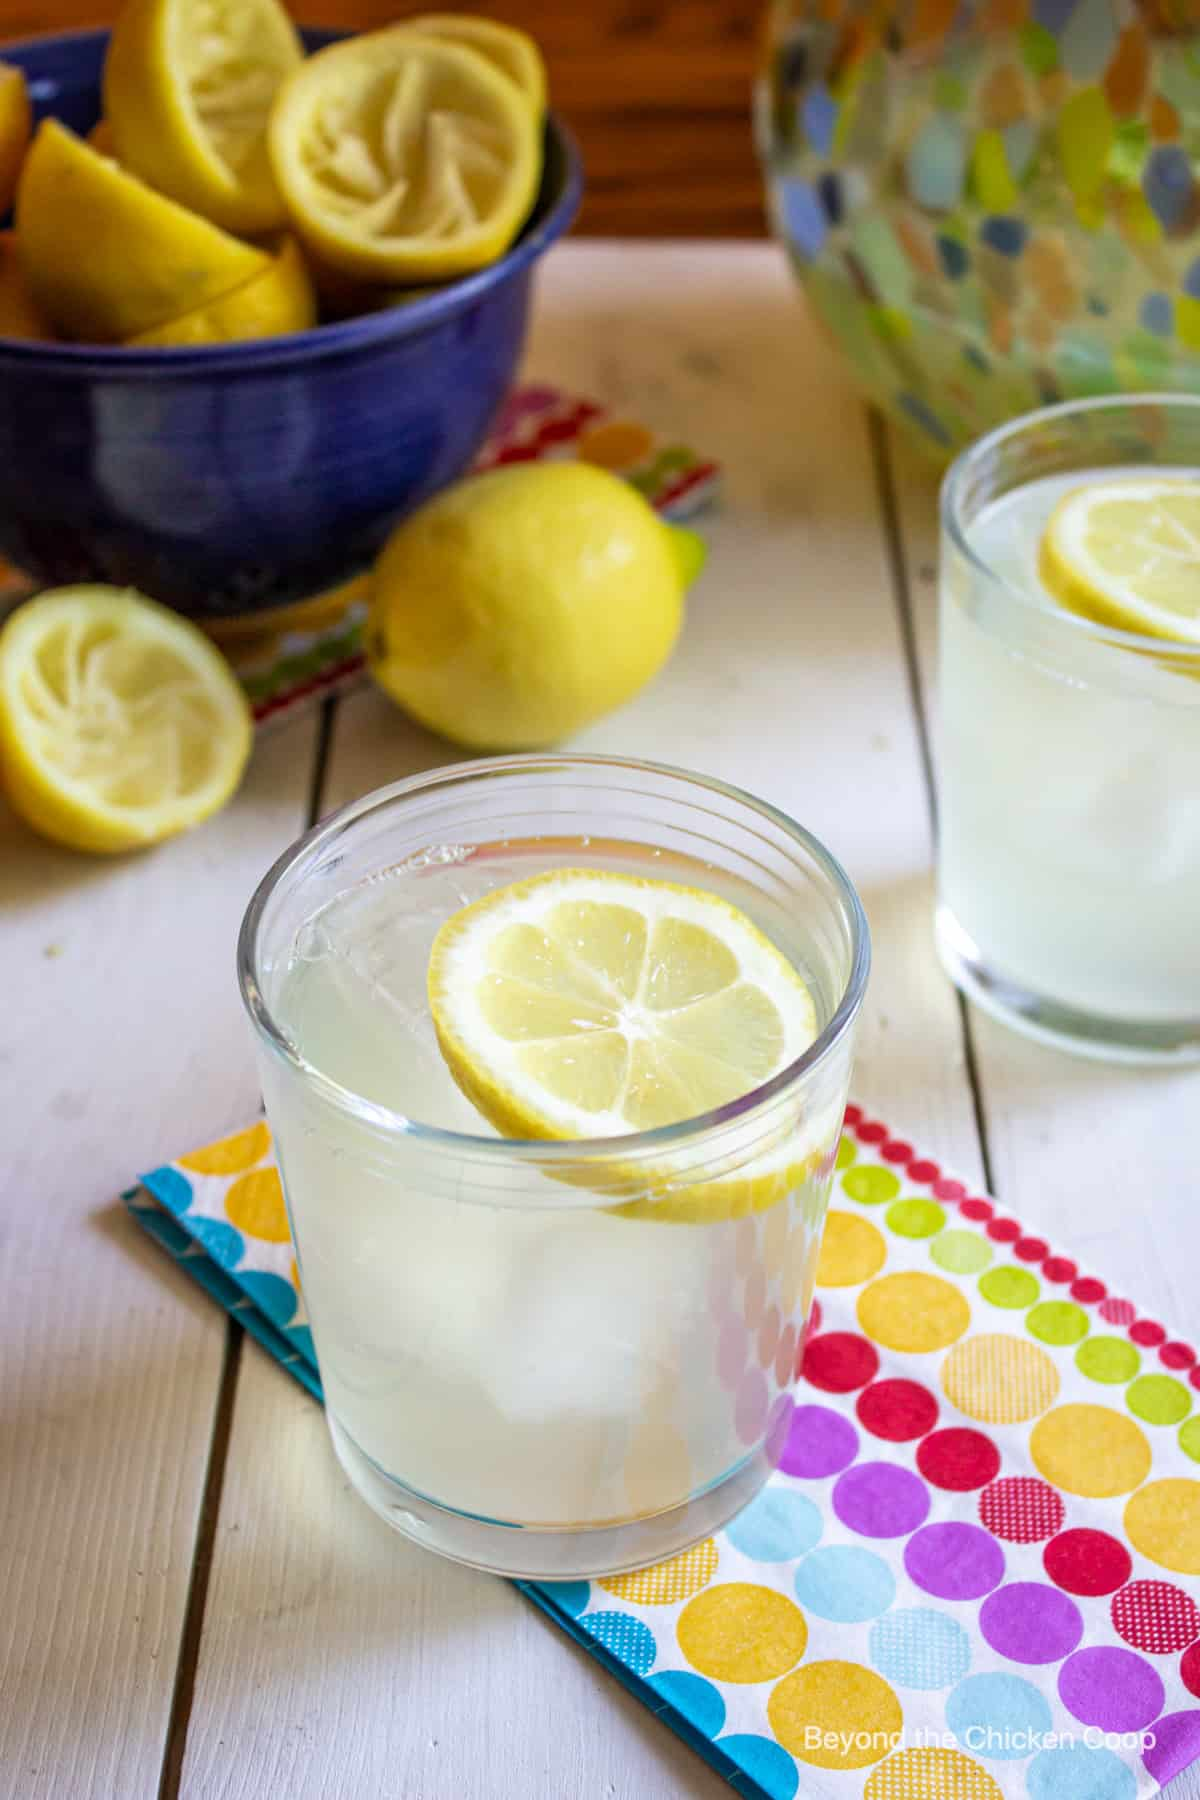 A glass of lemonade and a bowlful of lemons on a white board.